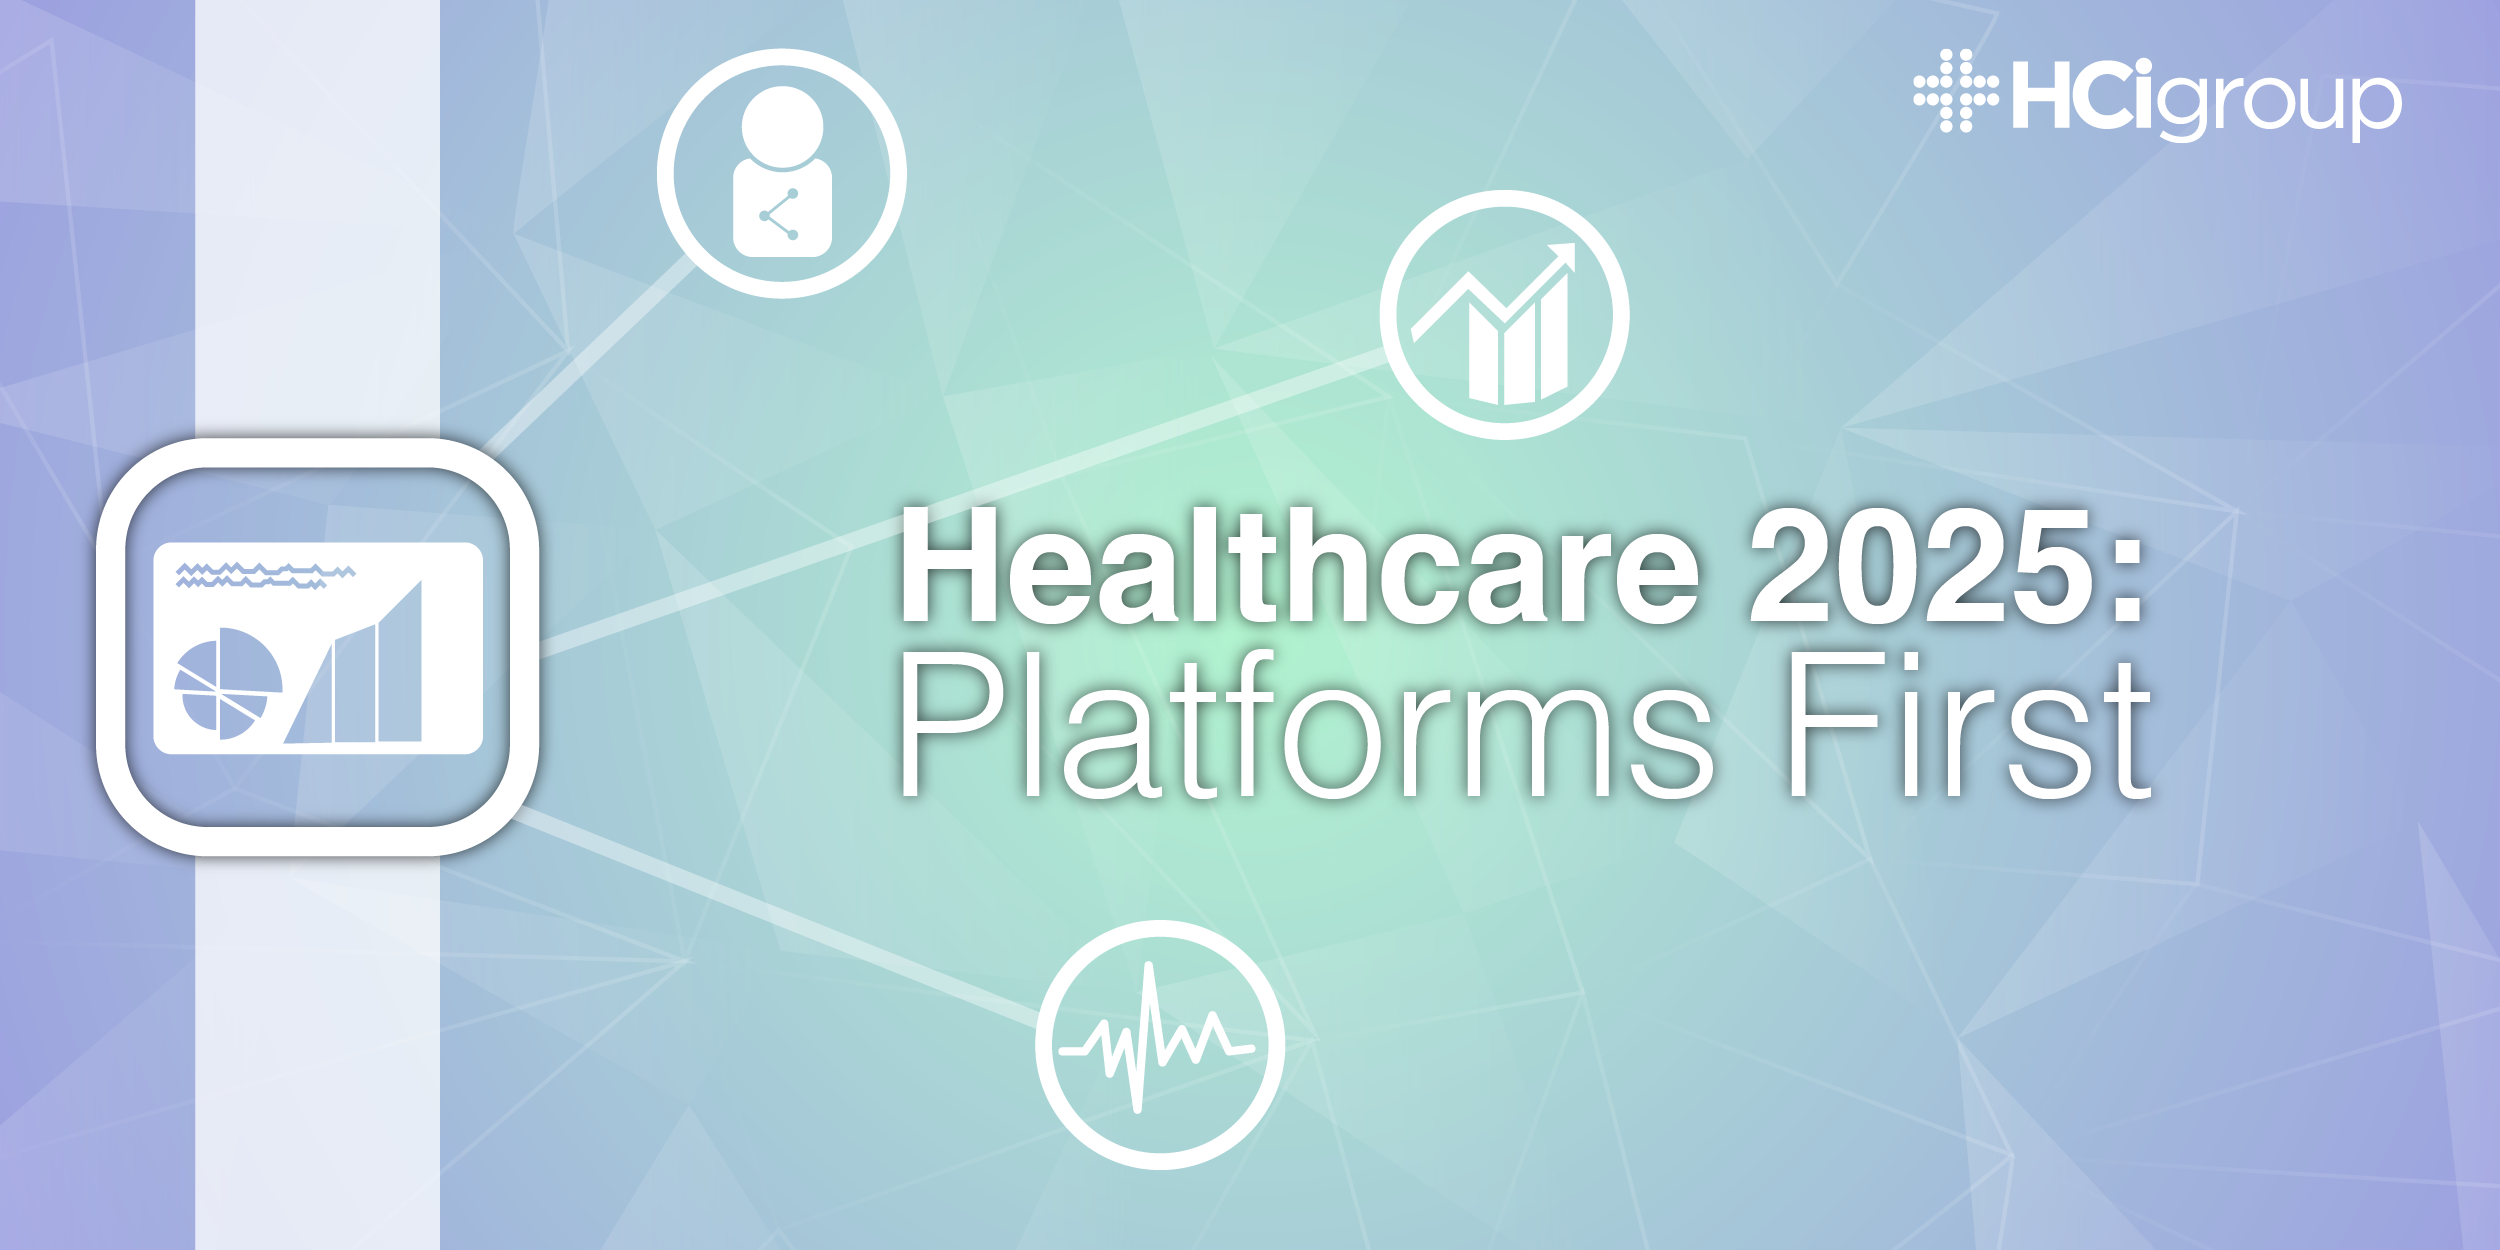 Healthcare 2025: Platforms First